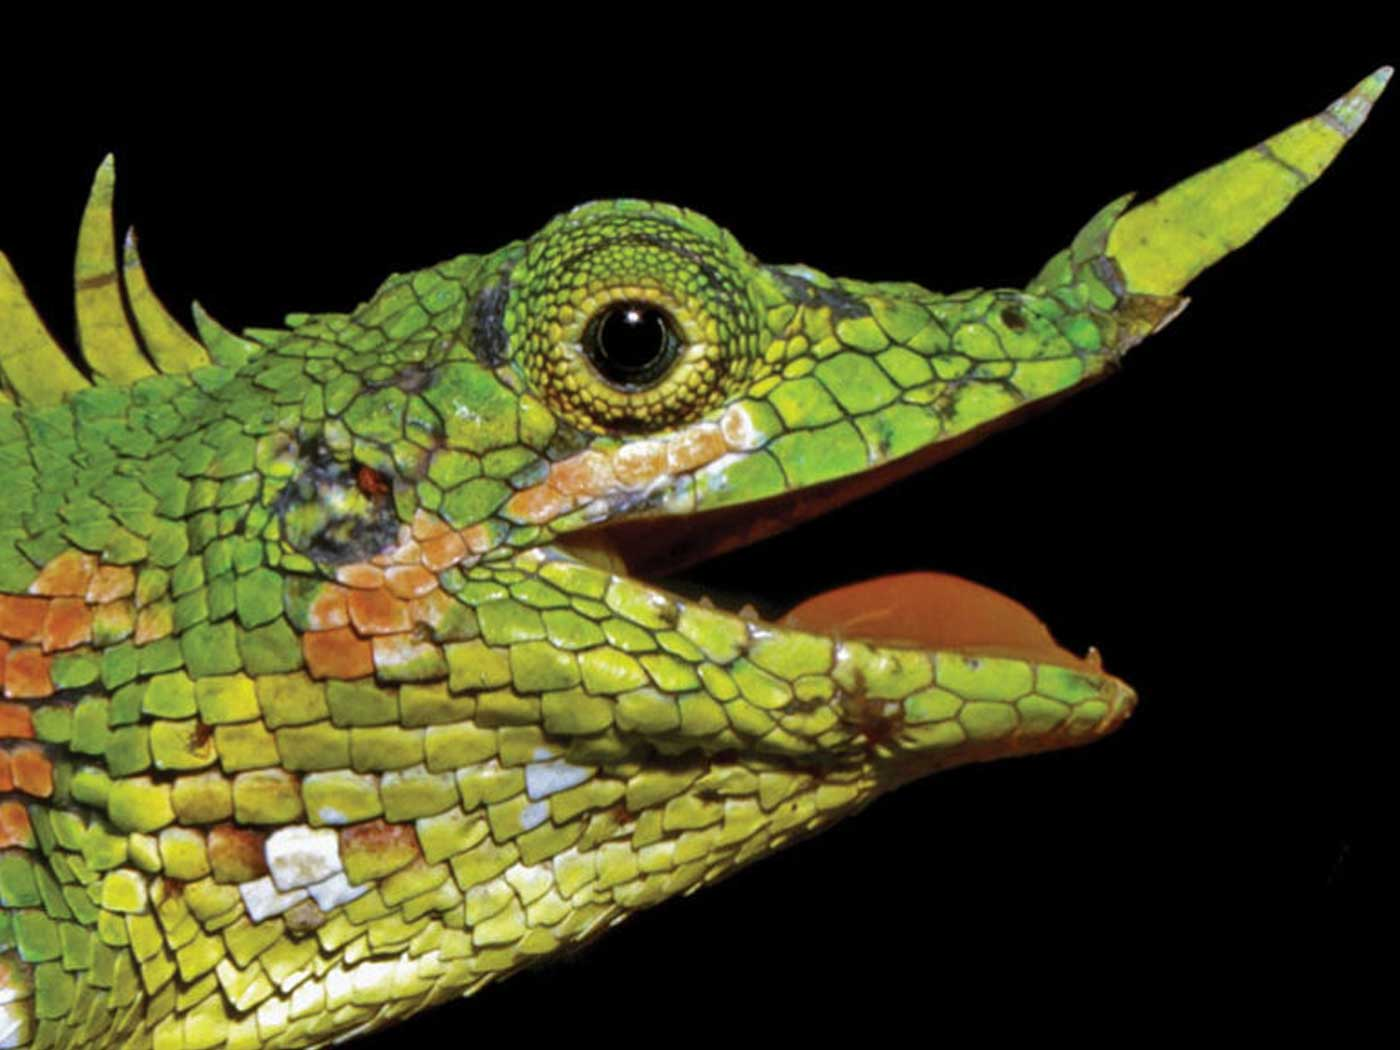 The rediscovered lizard - Harpesaurus Modigliani